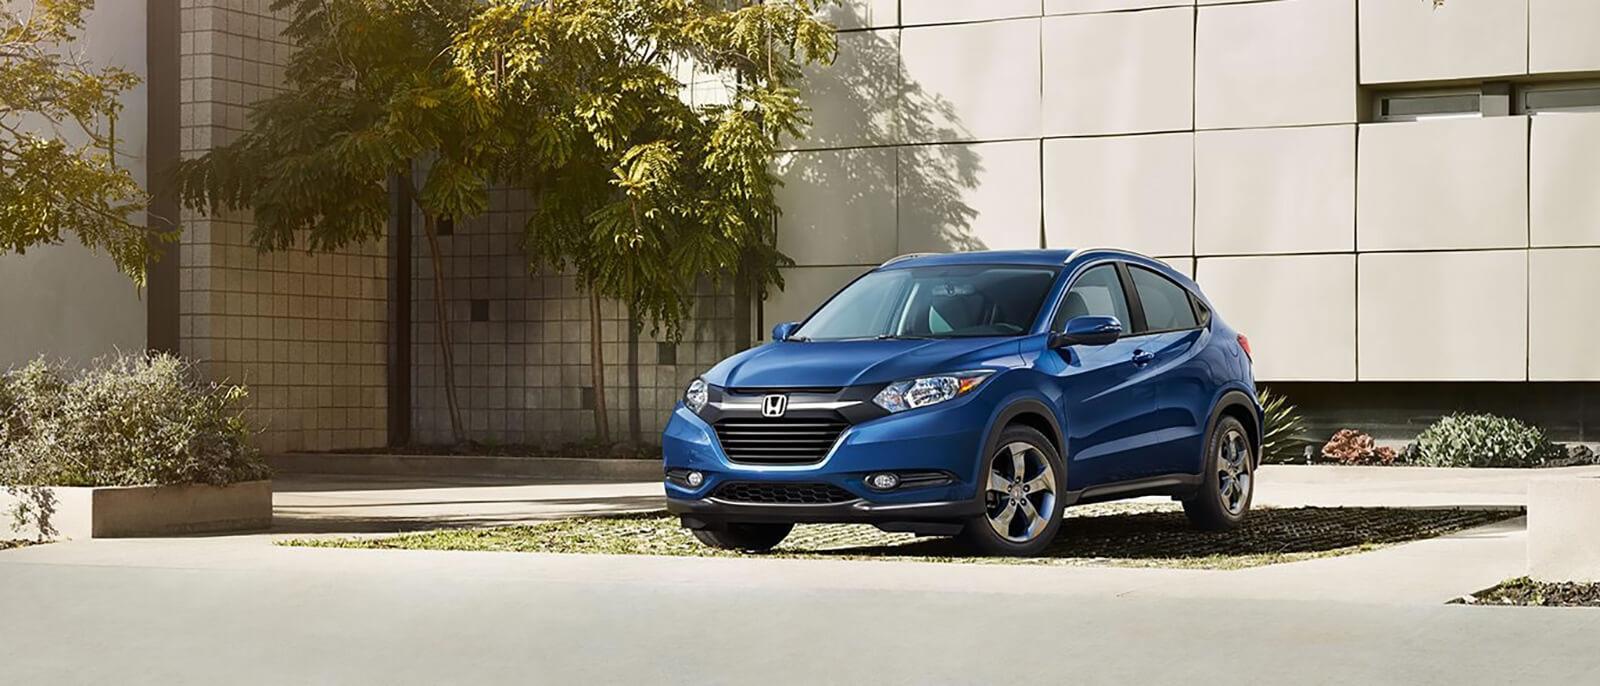 Honda hrv miles per gallon autos post for Honda dealership walnut creek